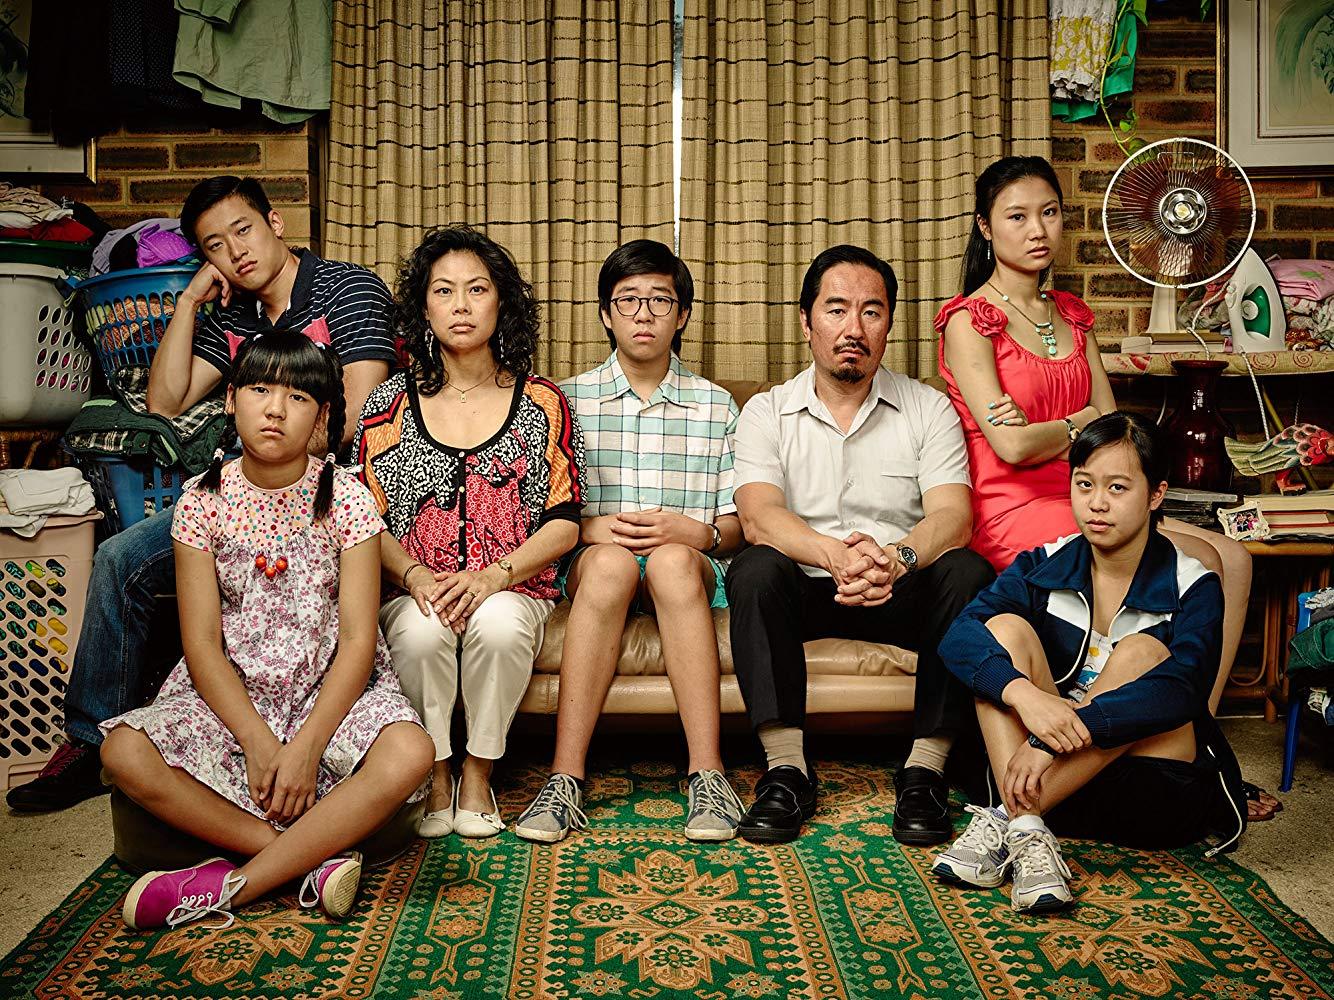 The Family Law - Season 3